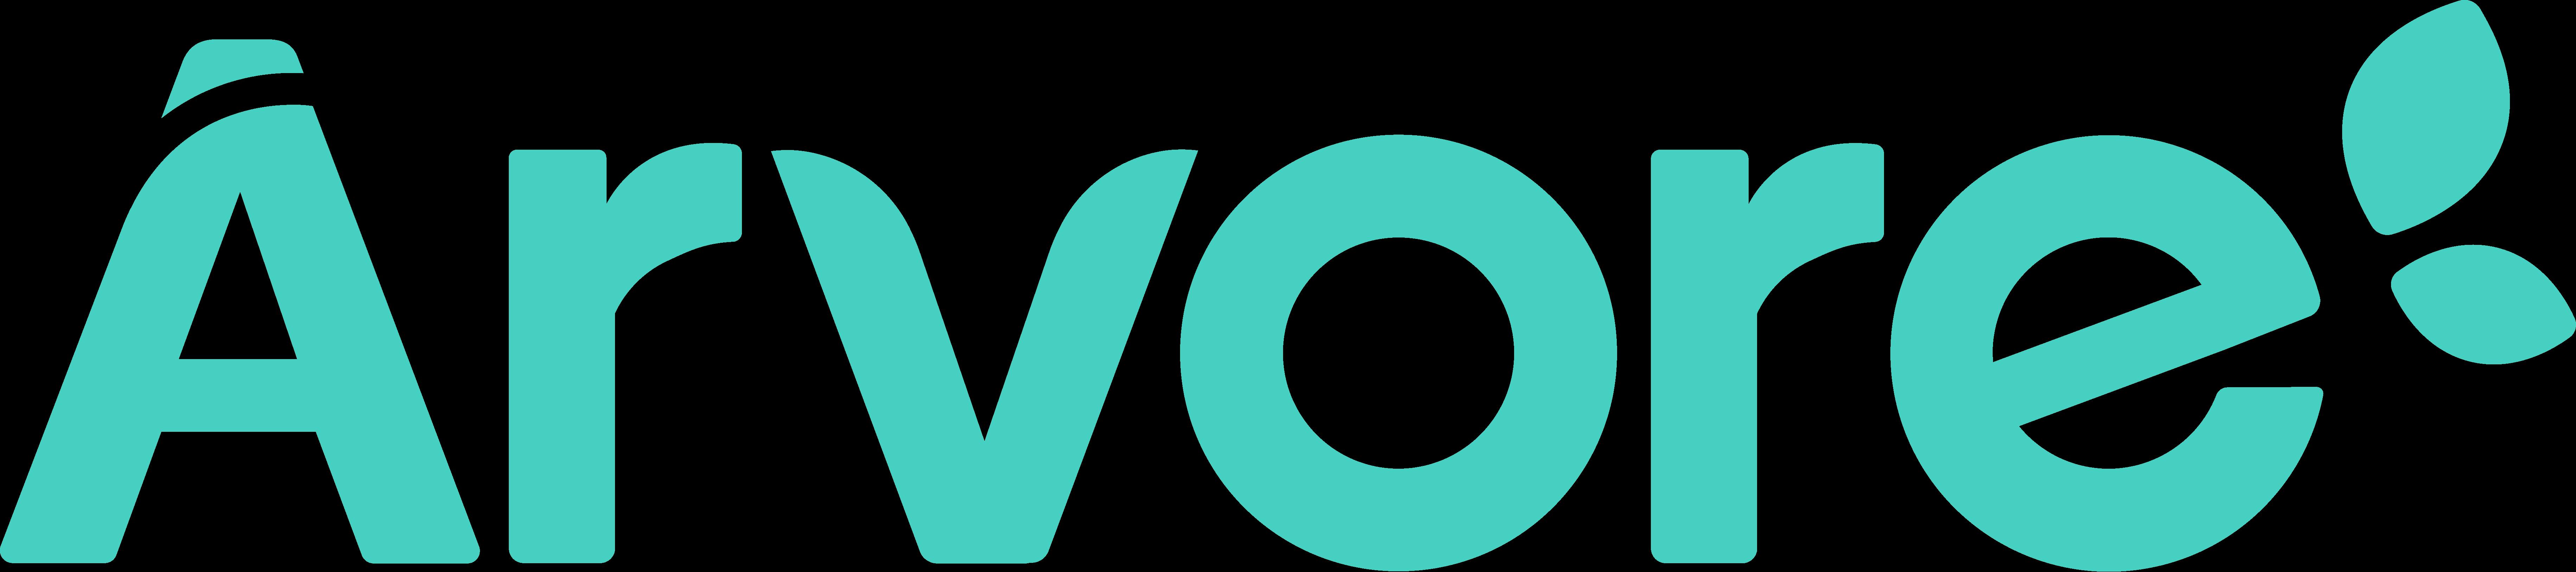 logo-arvore-verde